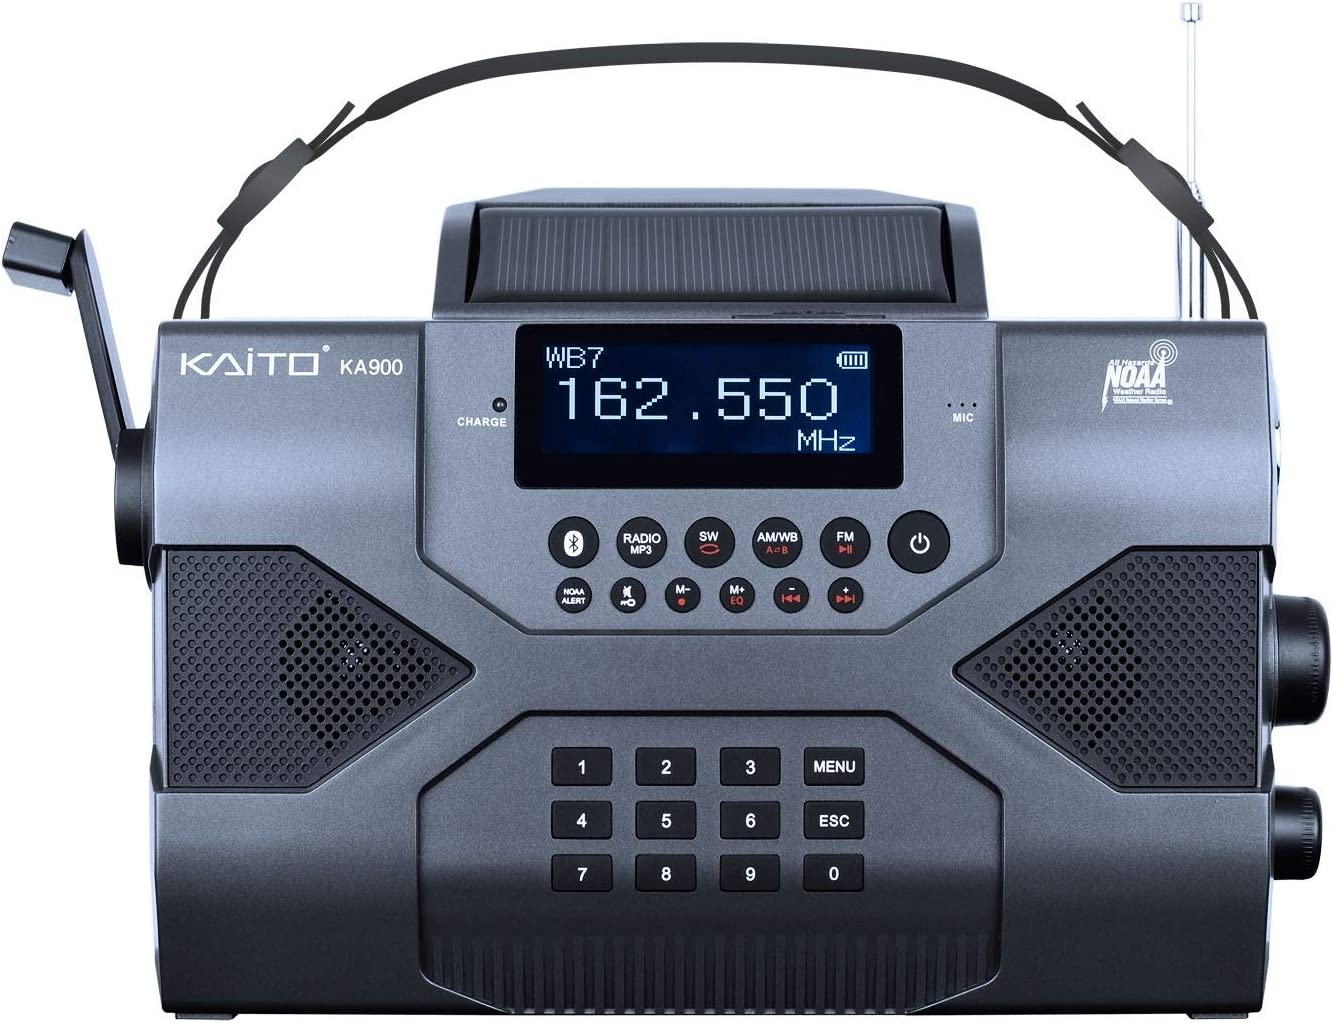 Kaito Emergency Radio Voyager Max Solar Las Vegas Mall Digital Dynamo Cra Complete Free Shipping KA900